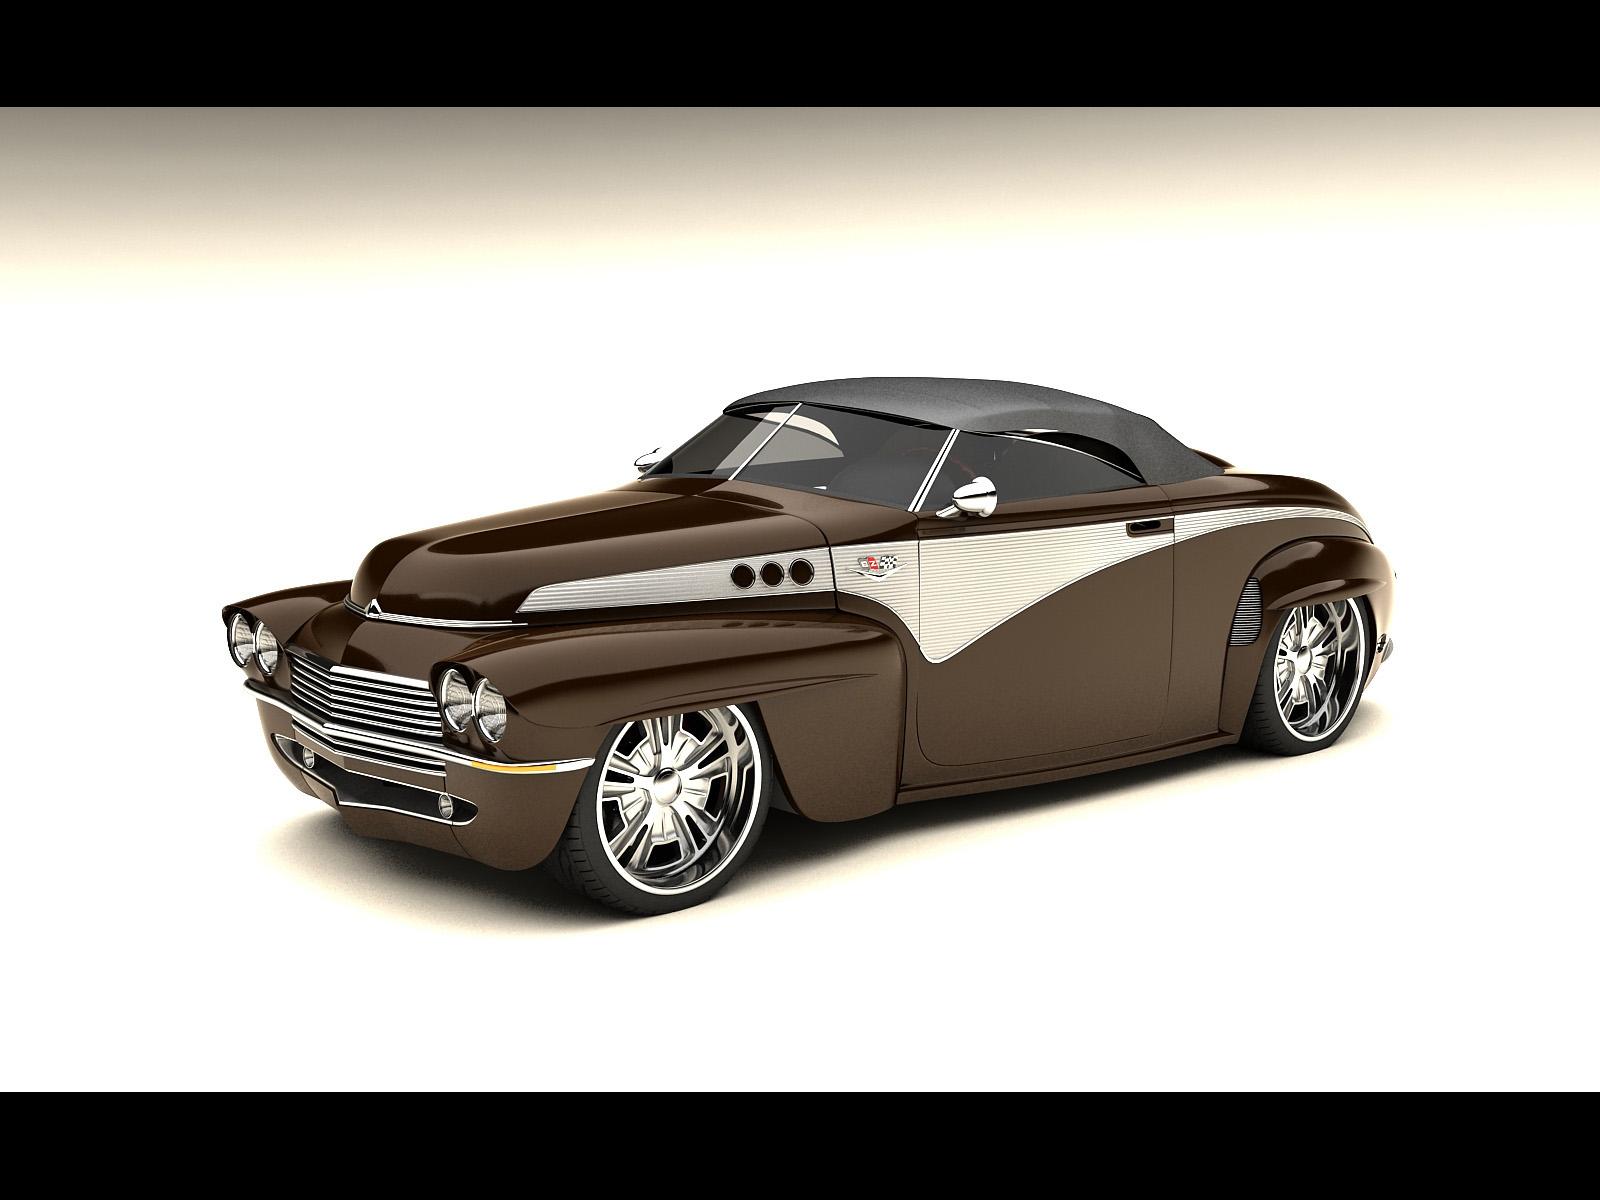 engine volvo t6 transmission richmond 6 Free Download Image Of